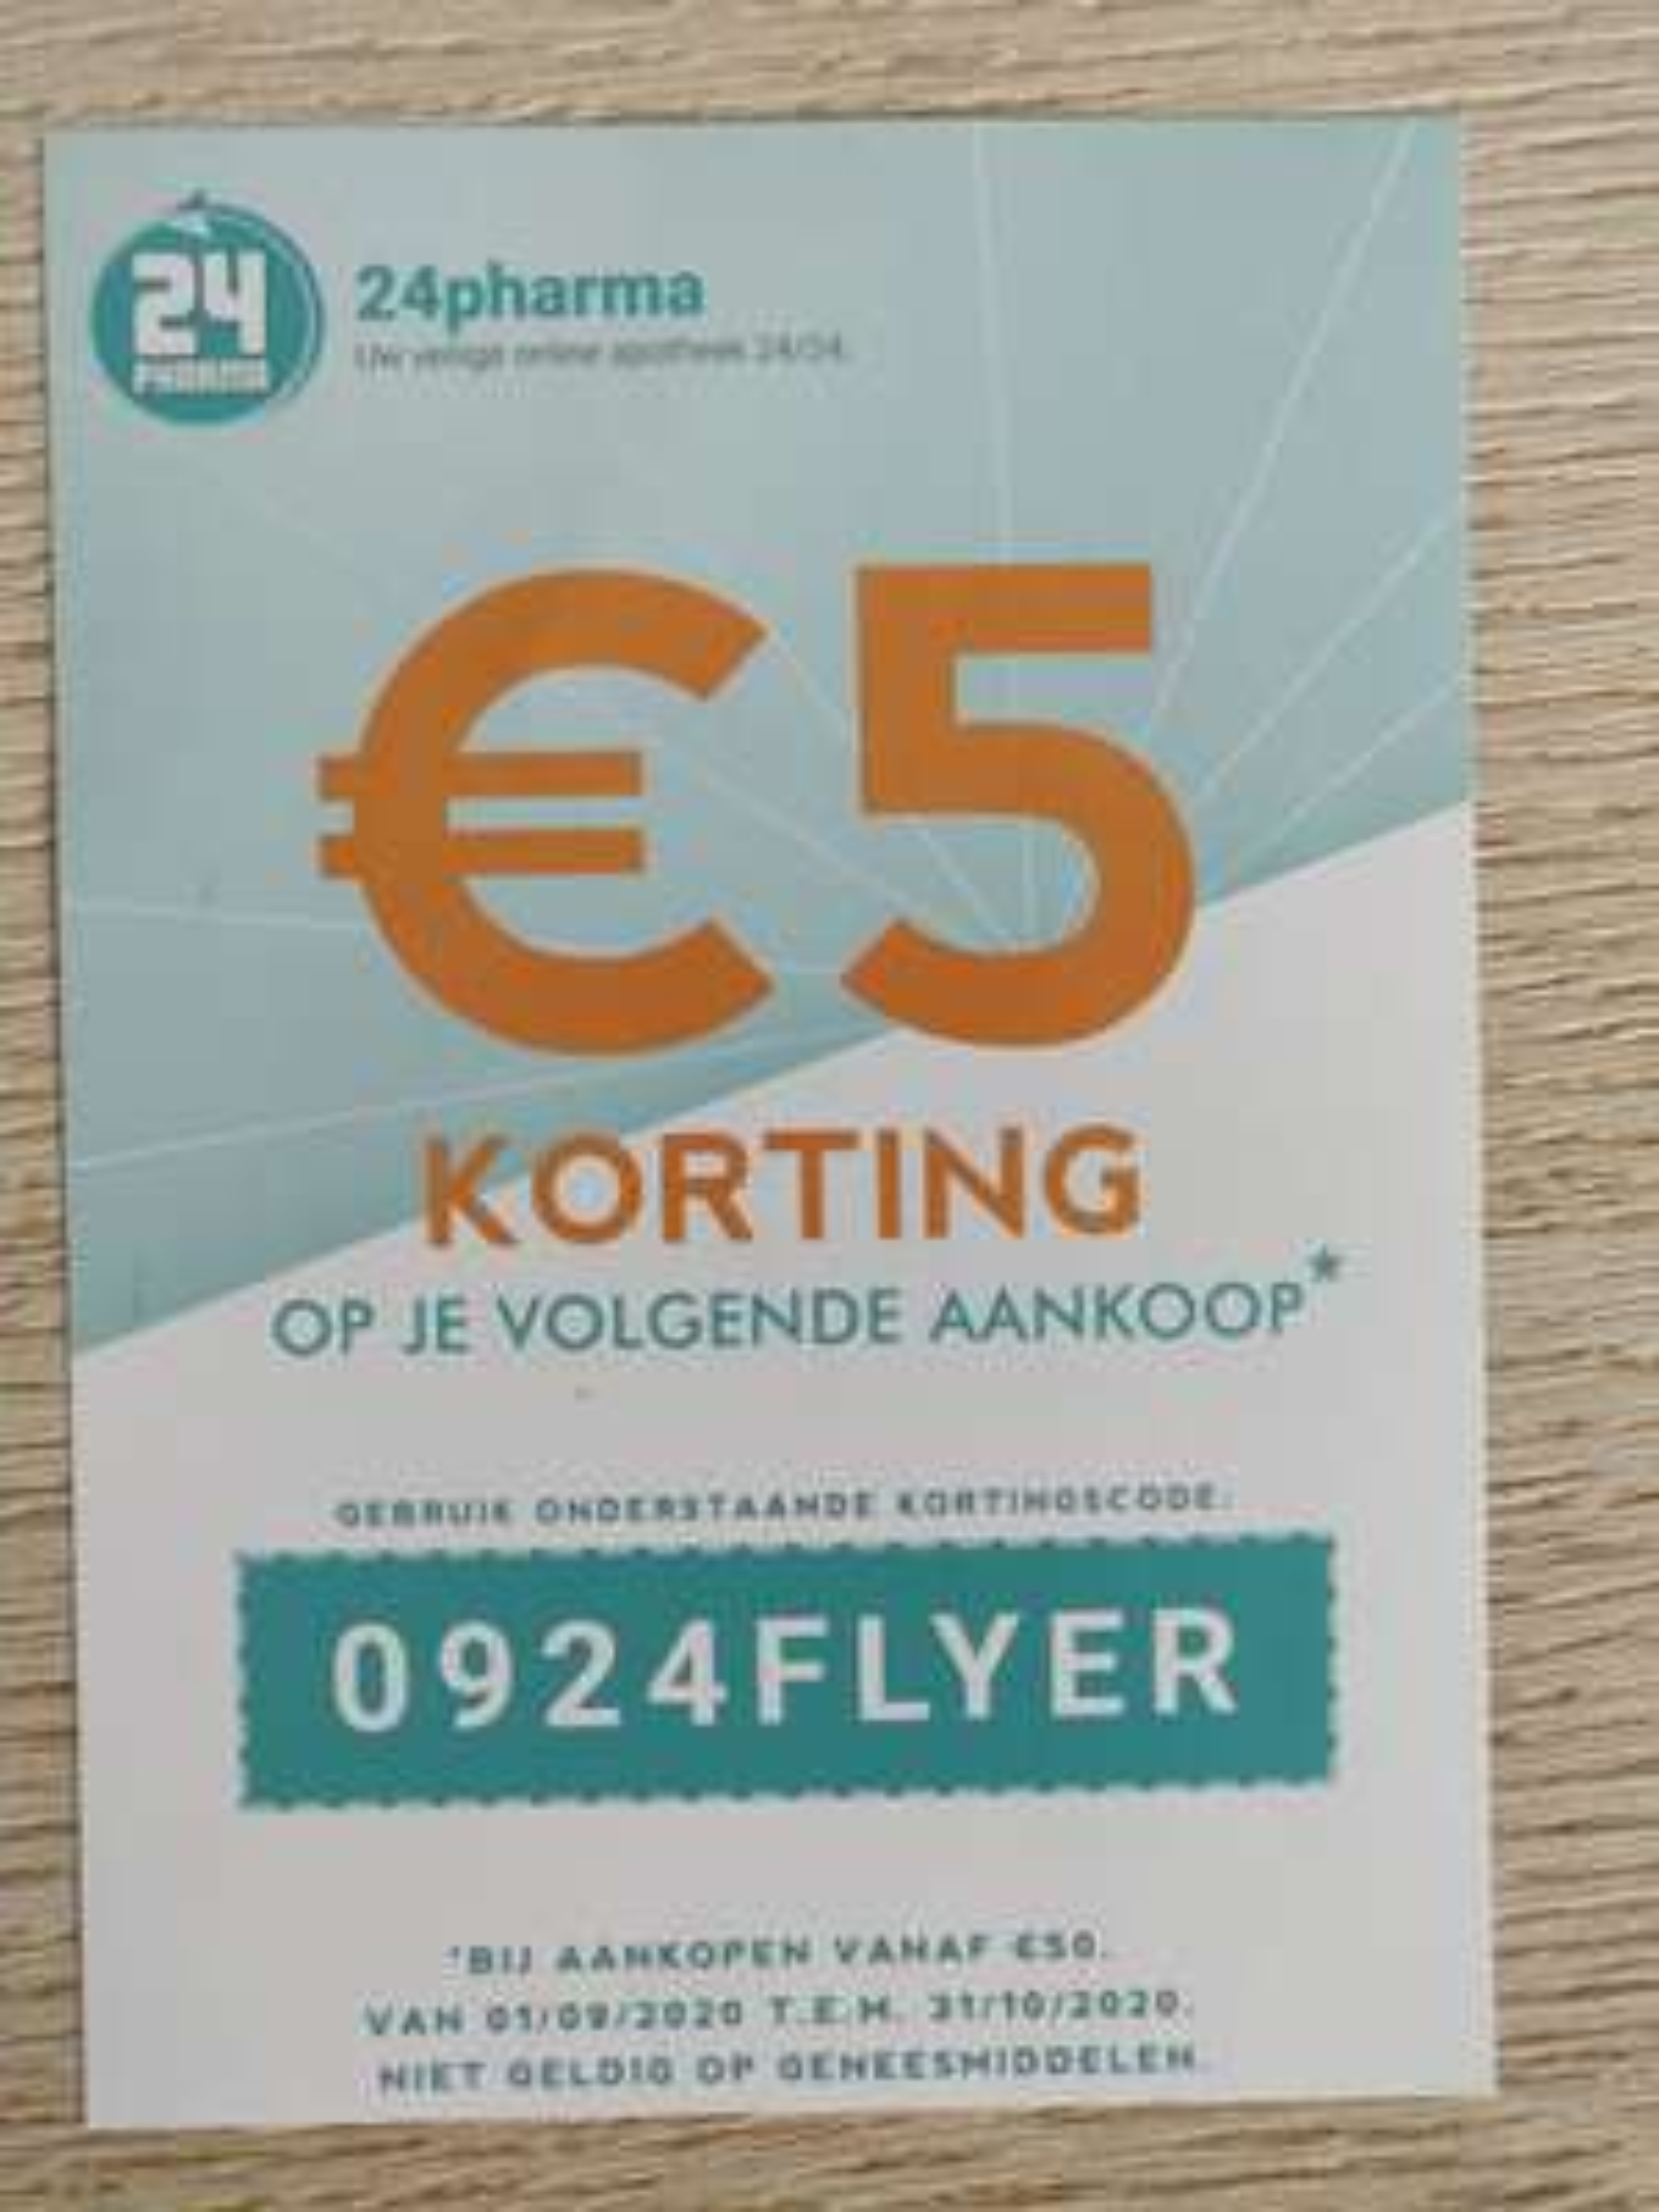 5€ Korting bij 24pharma.be bij minimale besteding vanaf €50